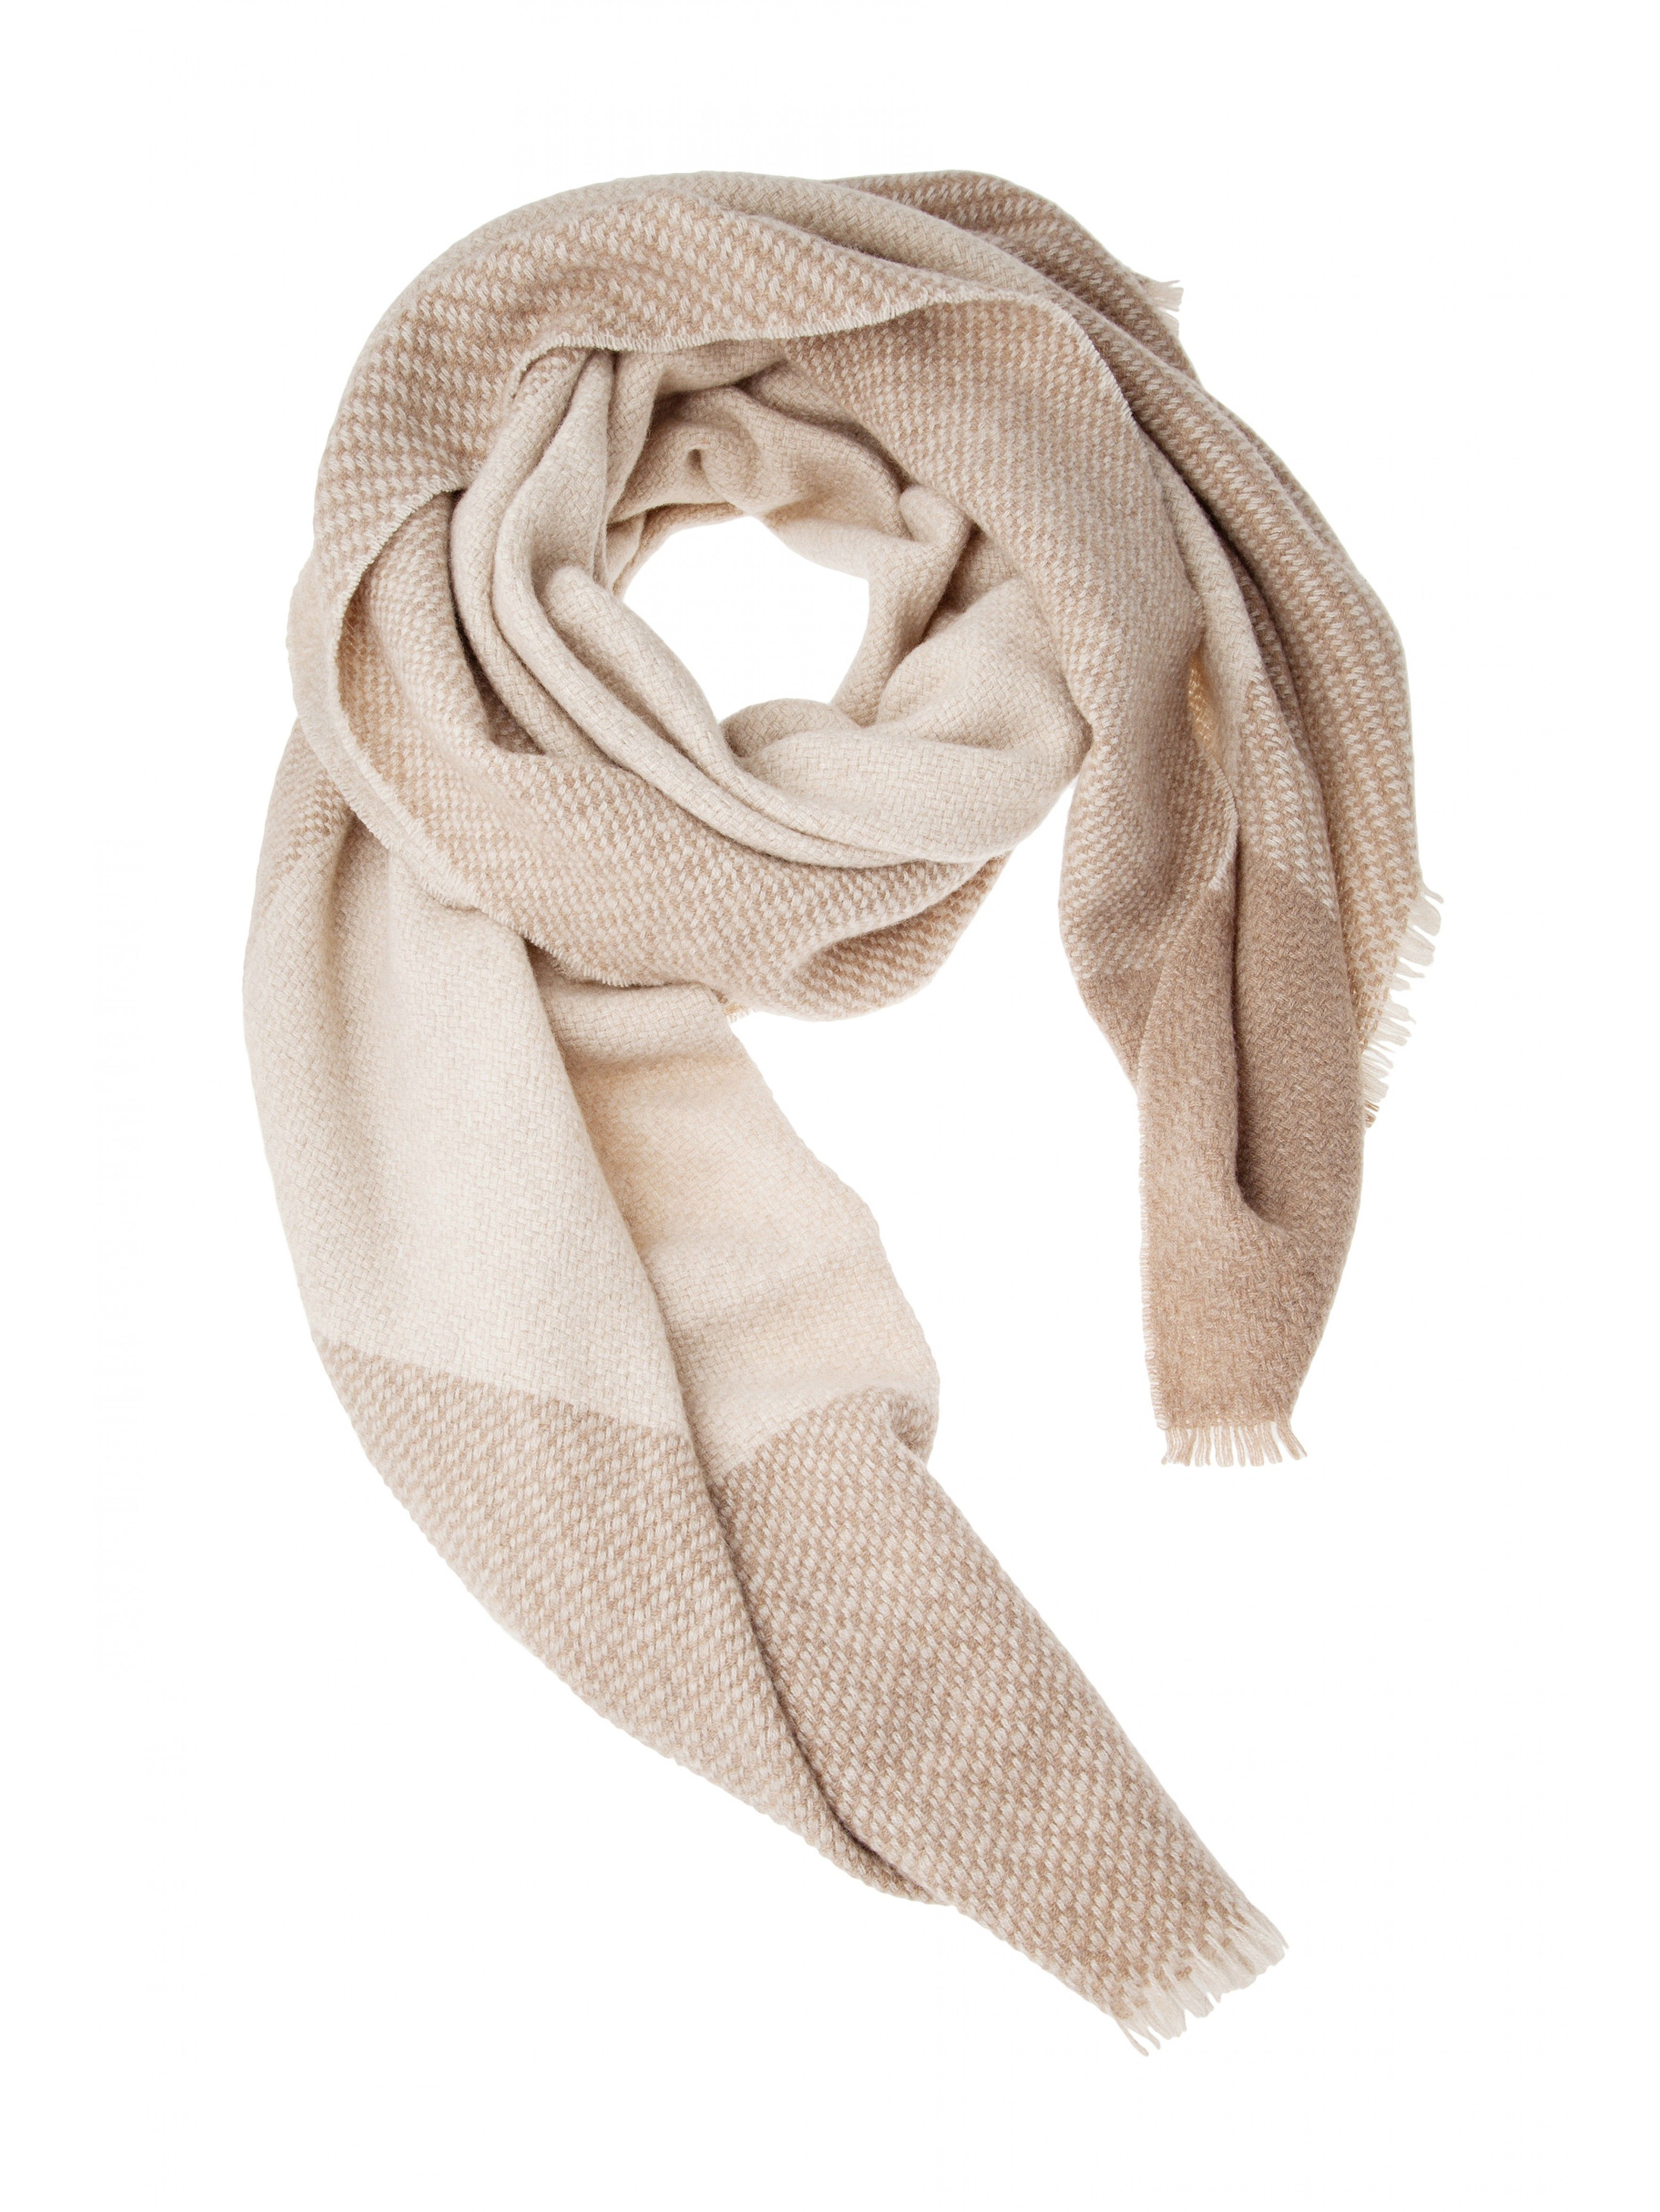 nero kyoko kikuchi franco m scarf others fs ferrari s goodsimagepopup block kkcloset bianco pl